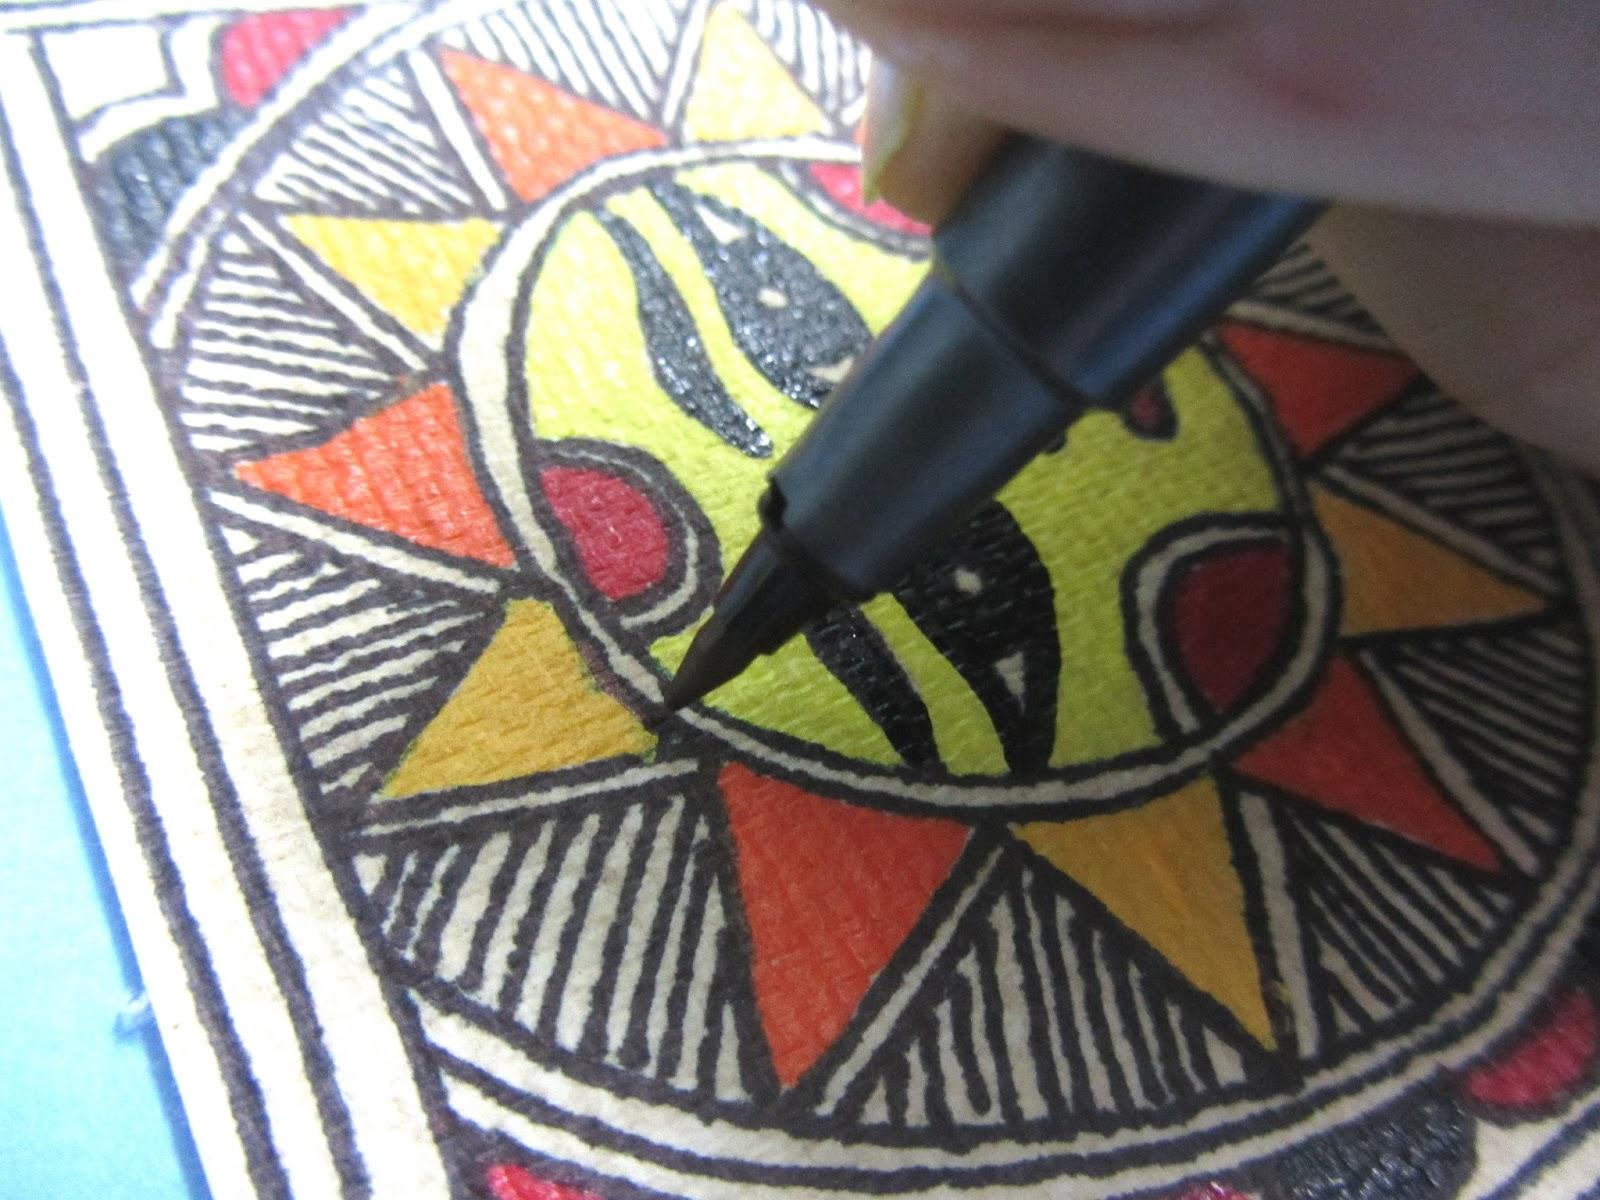 Crazylassis madhubani art practice and research blog how to make crazylassis madhubani art practice and research blog how to make madhubani greeting cards kristyandbryce Gallery